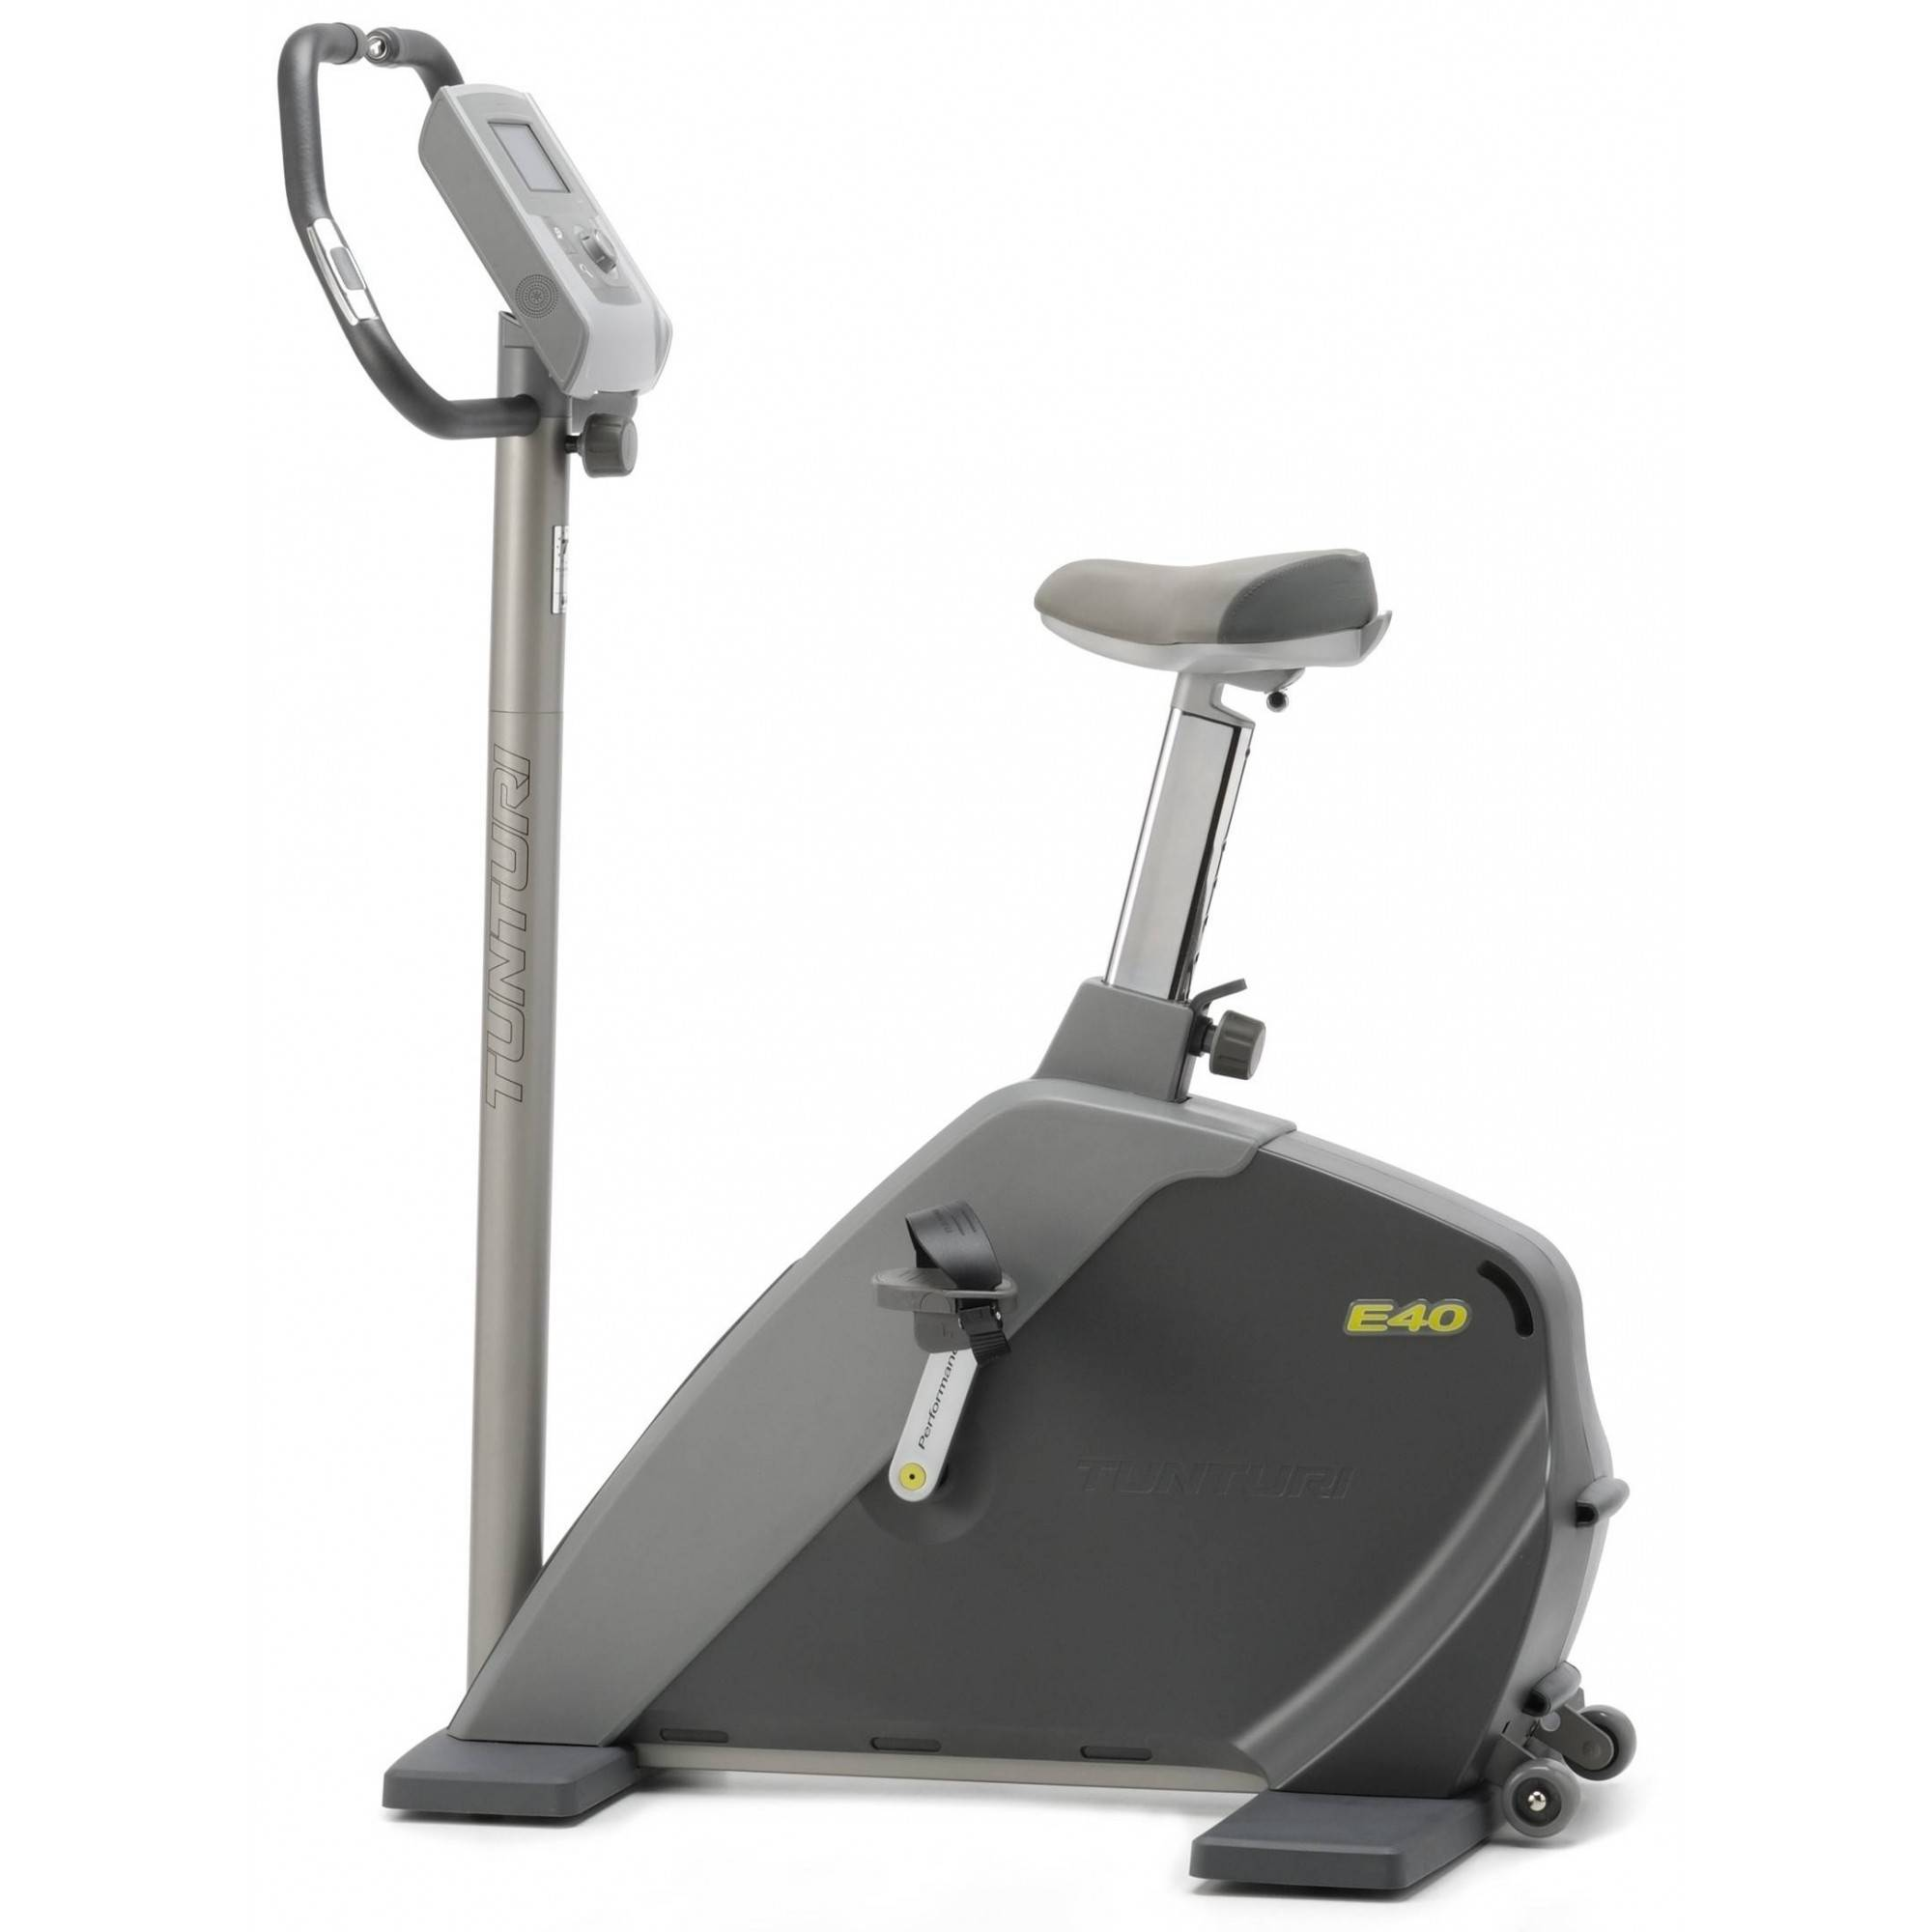 Rower treningowy pionowy Tunturi E40 | indukcyjny Tunturi - 1 | klubfitness.pl